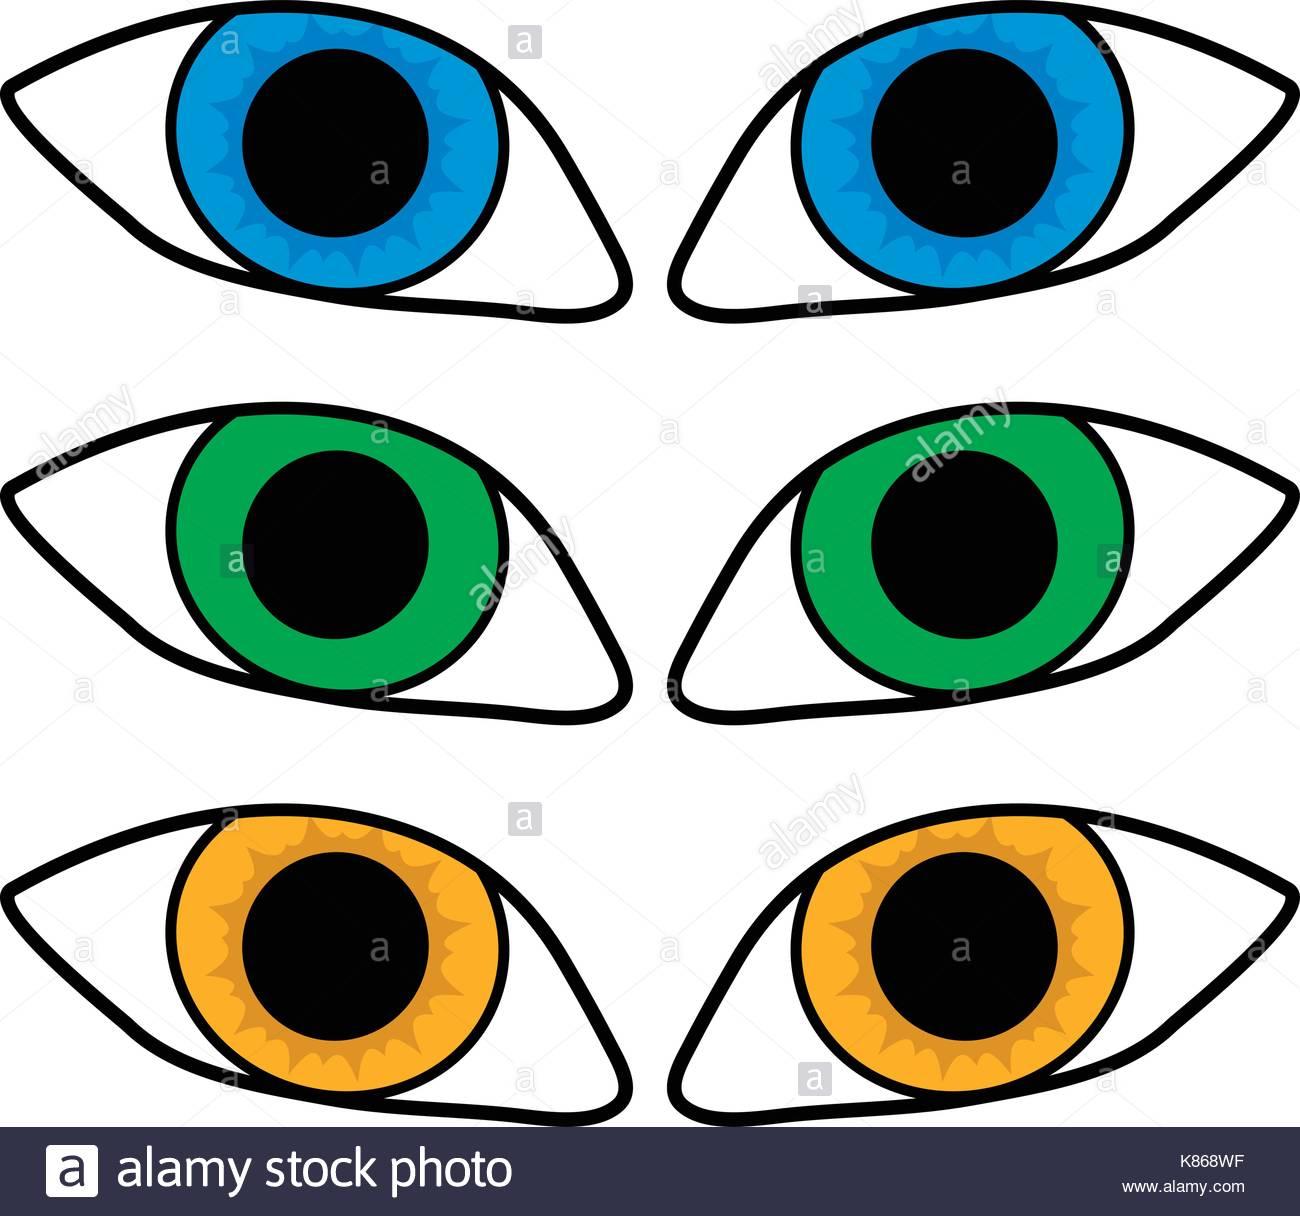 1300x1216 Eye Silhouette Vector Symbol Icon Design. Beautiful Illustration